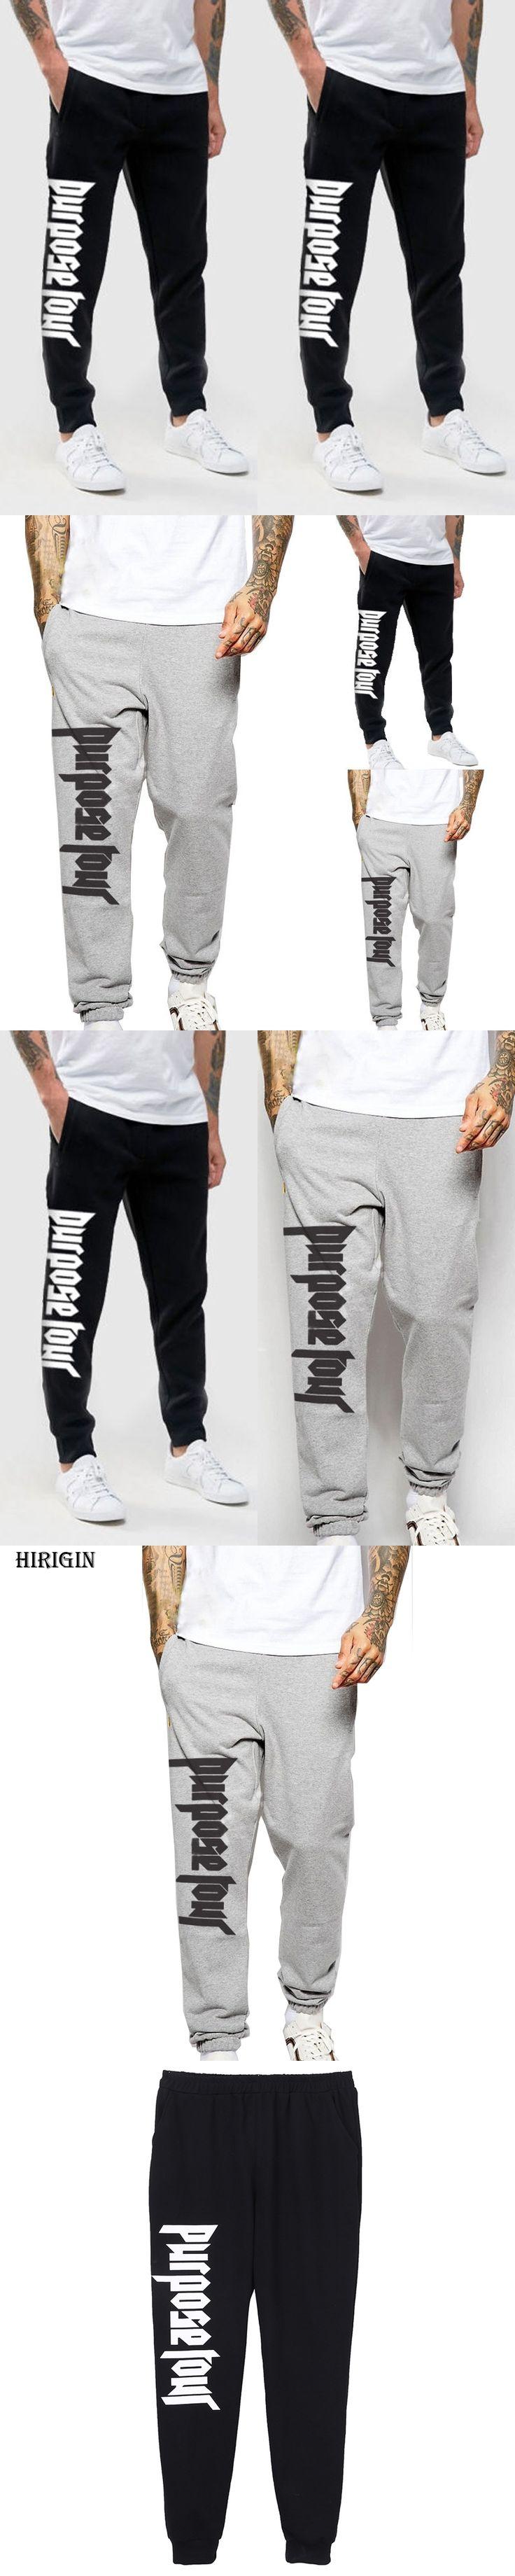 Justin Bieber PURPOSE TOUR Pants Sweatpants Mens Long Baggy Harem Slacks Trousers